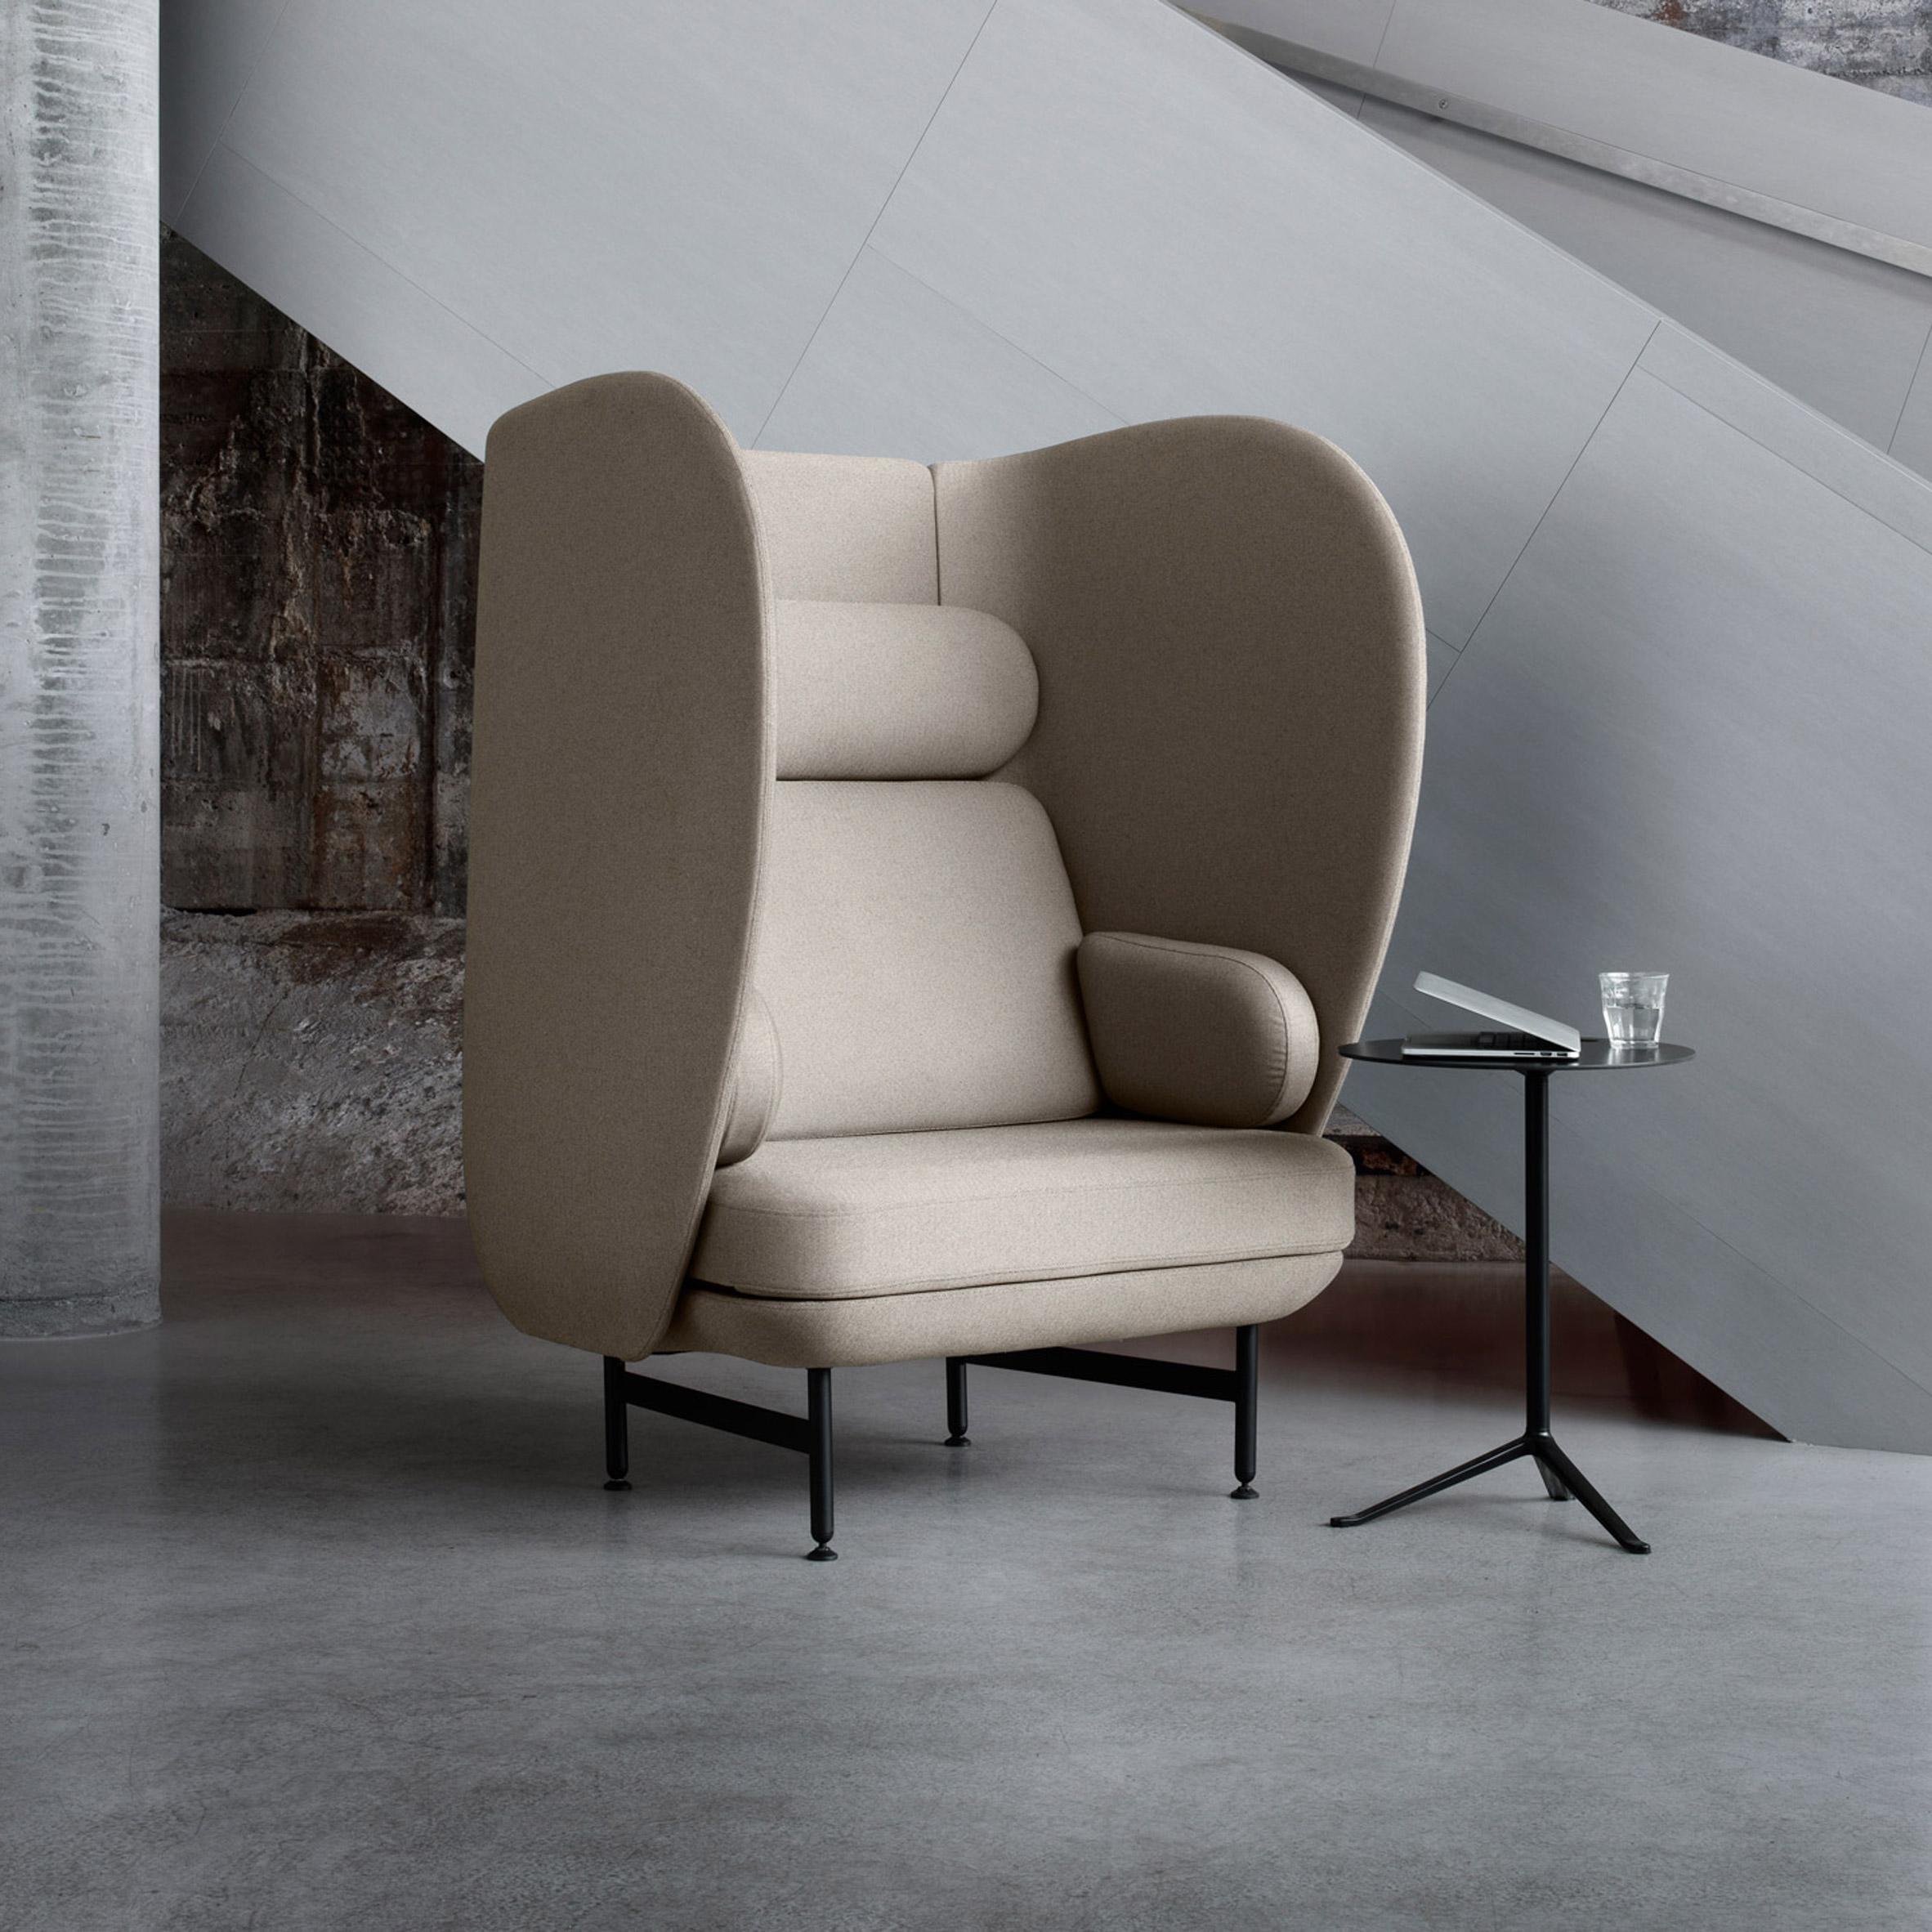 Office furniture is in a hybrid moment says designer jaime hayón